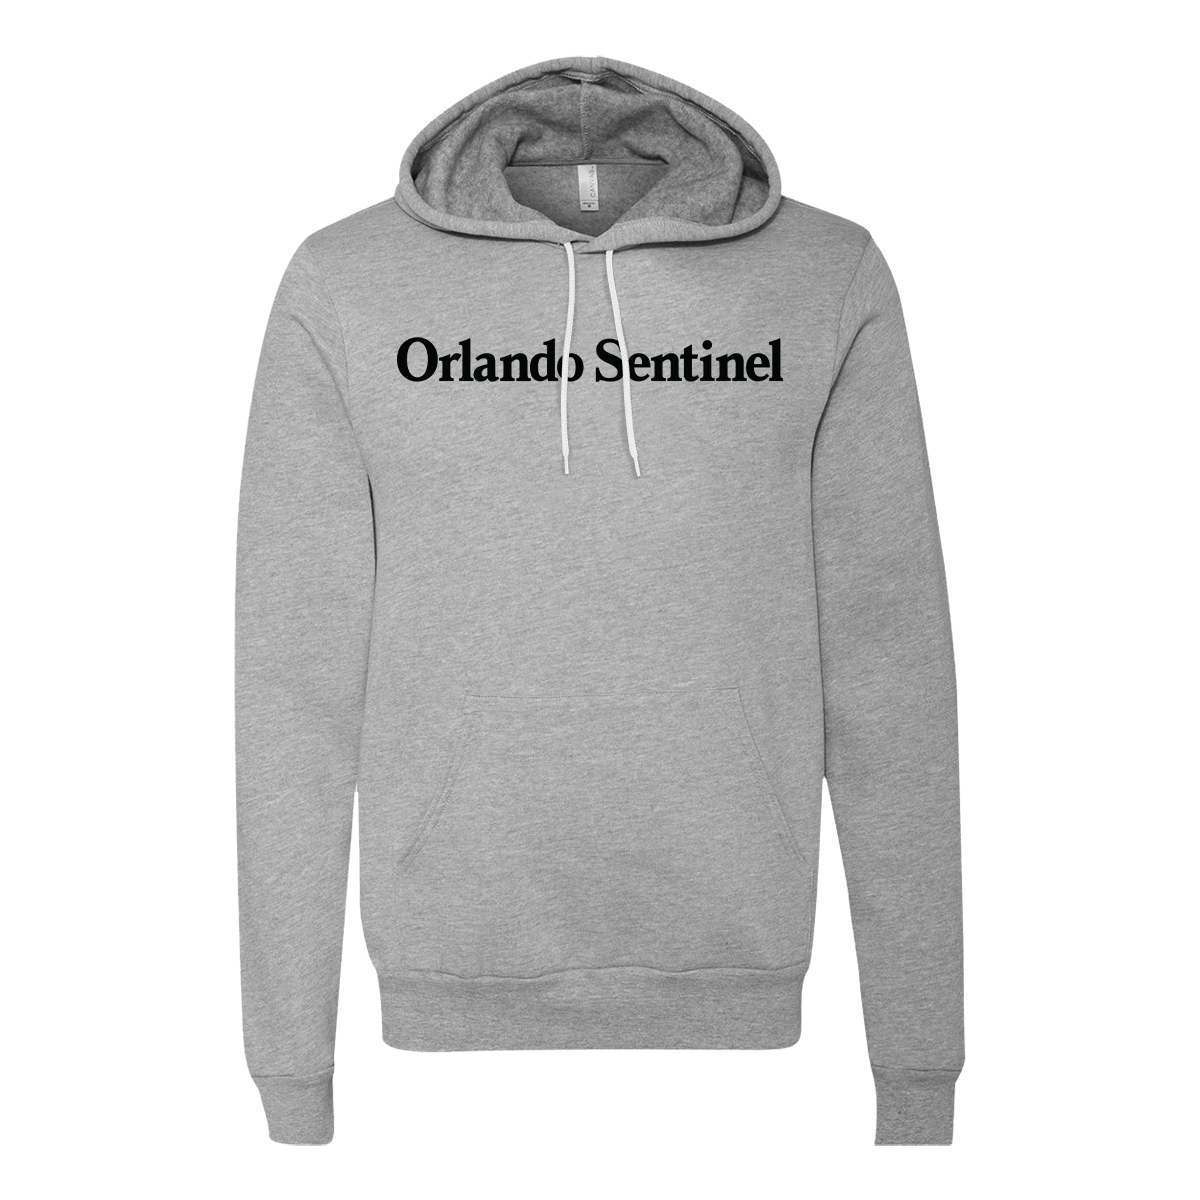 Orlando Sentinel Pullover Hoodie